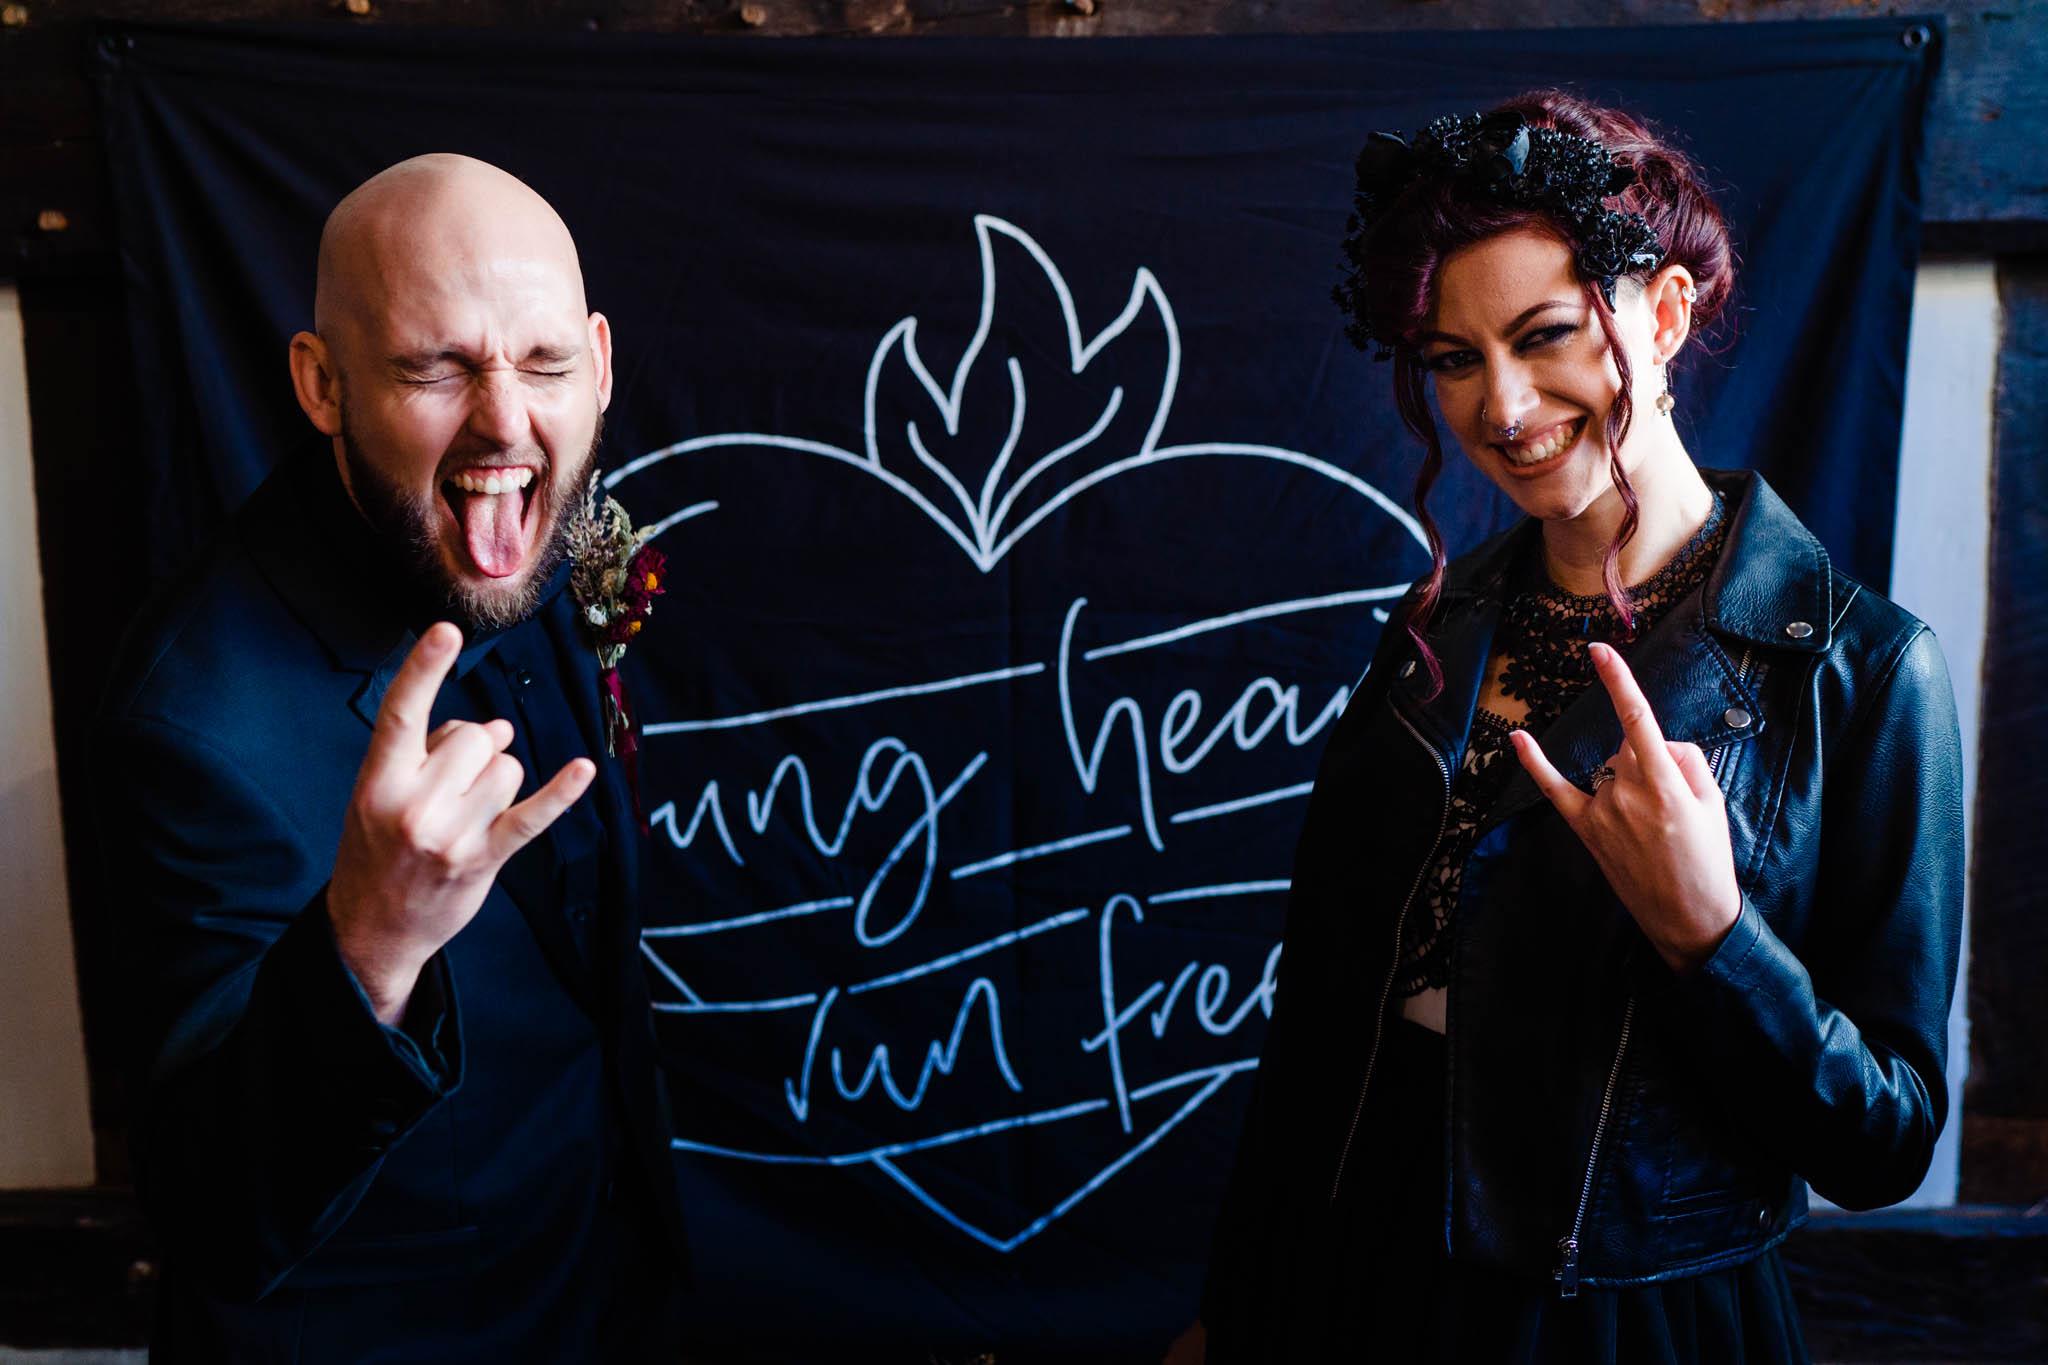 elegant gothic wedding - gothic wedding - autumn wedding - young hearts run free sign